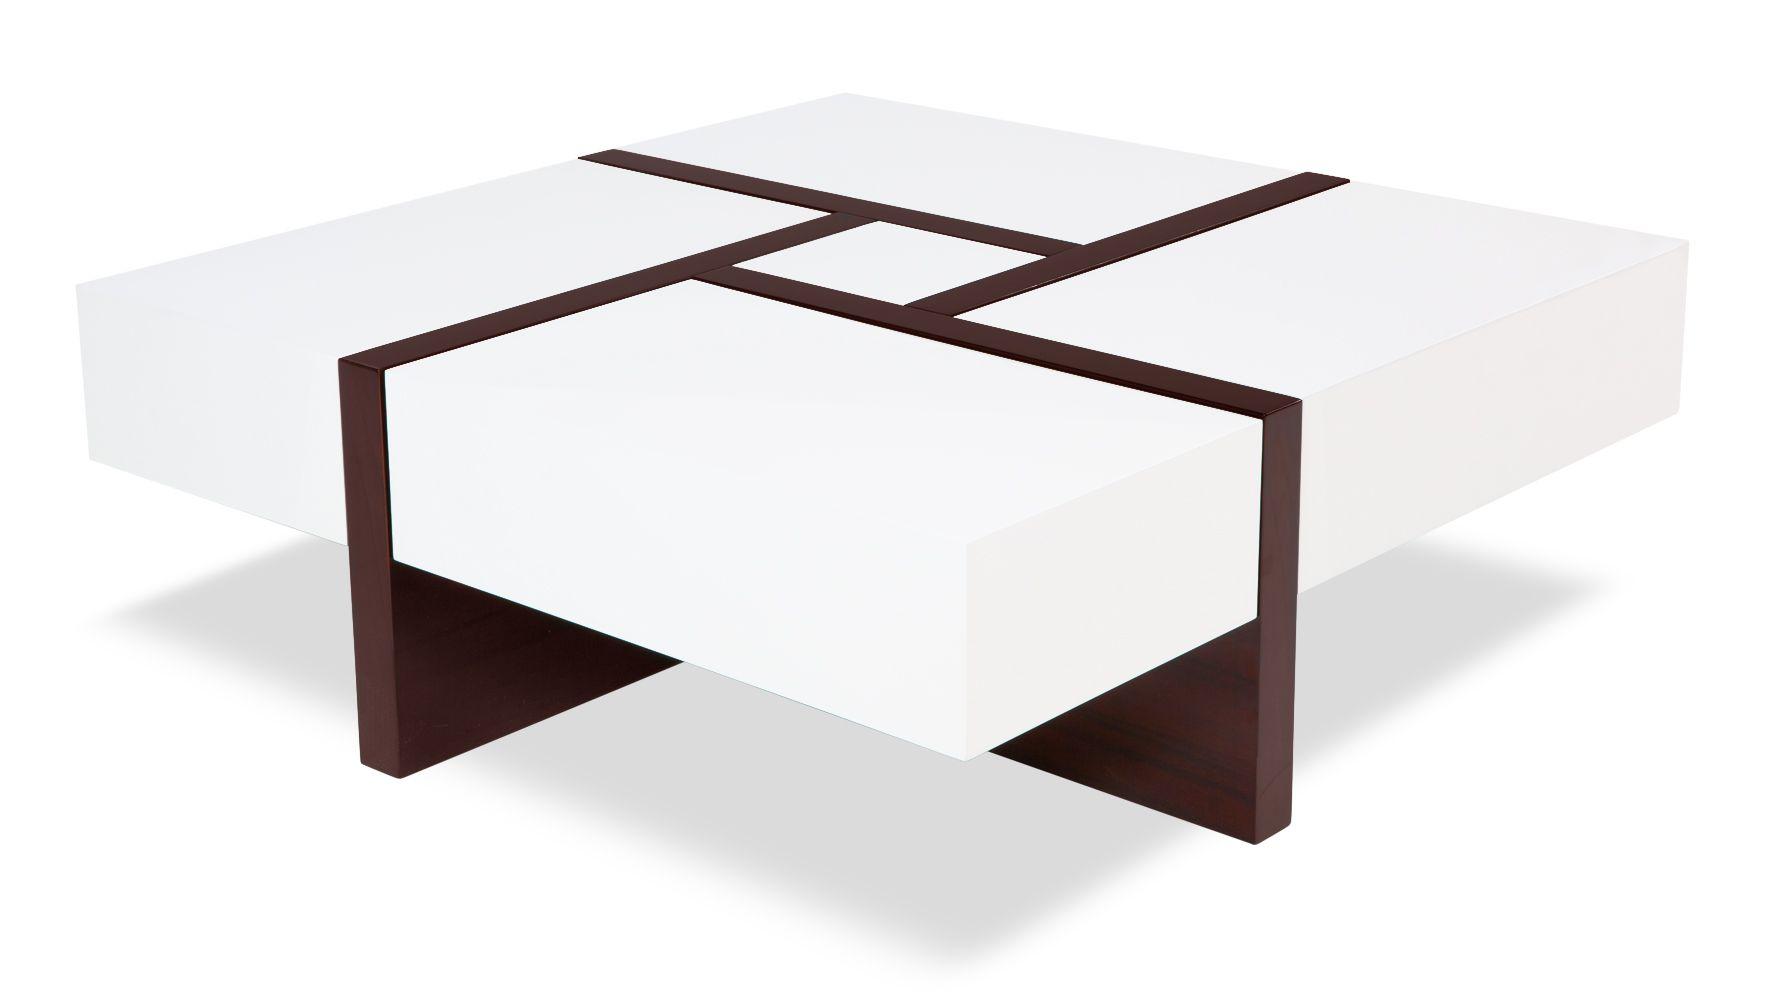 Mcintosh High Gloss Coffee Table with Storage - White Square | Zuri Furniture